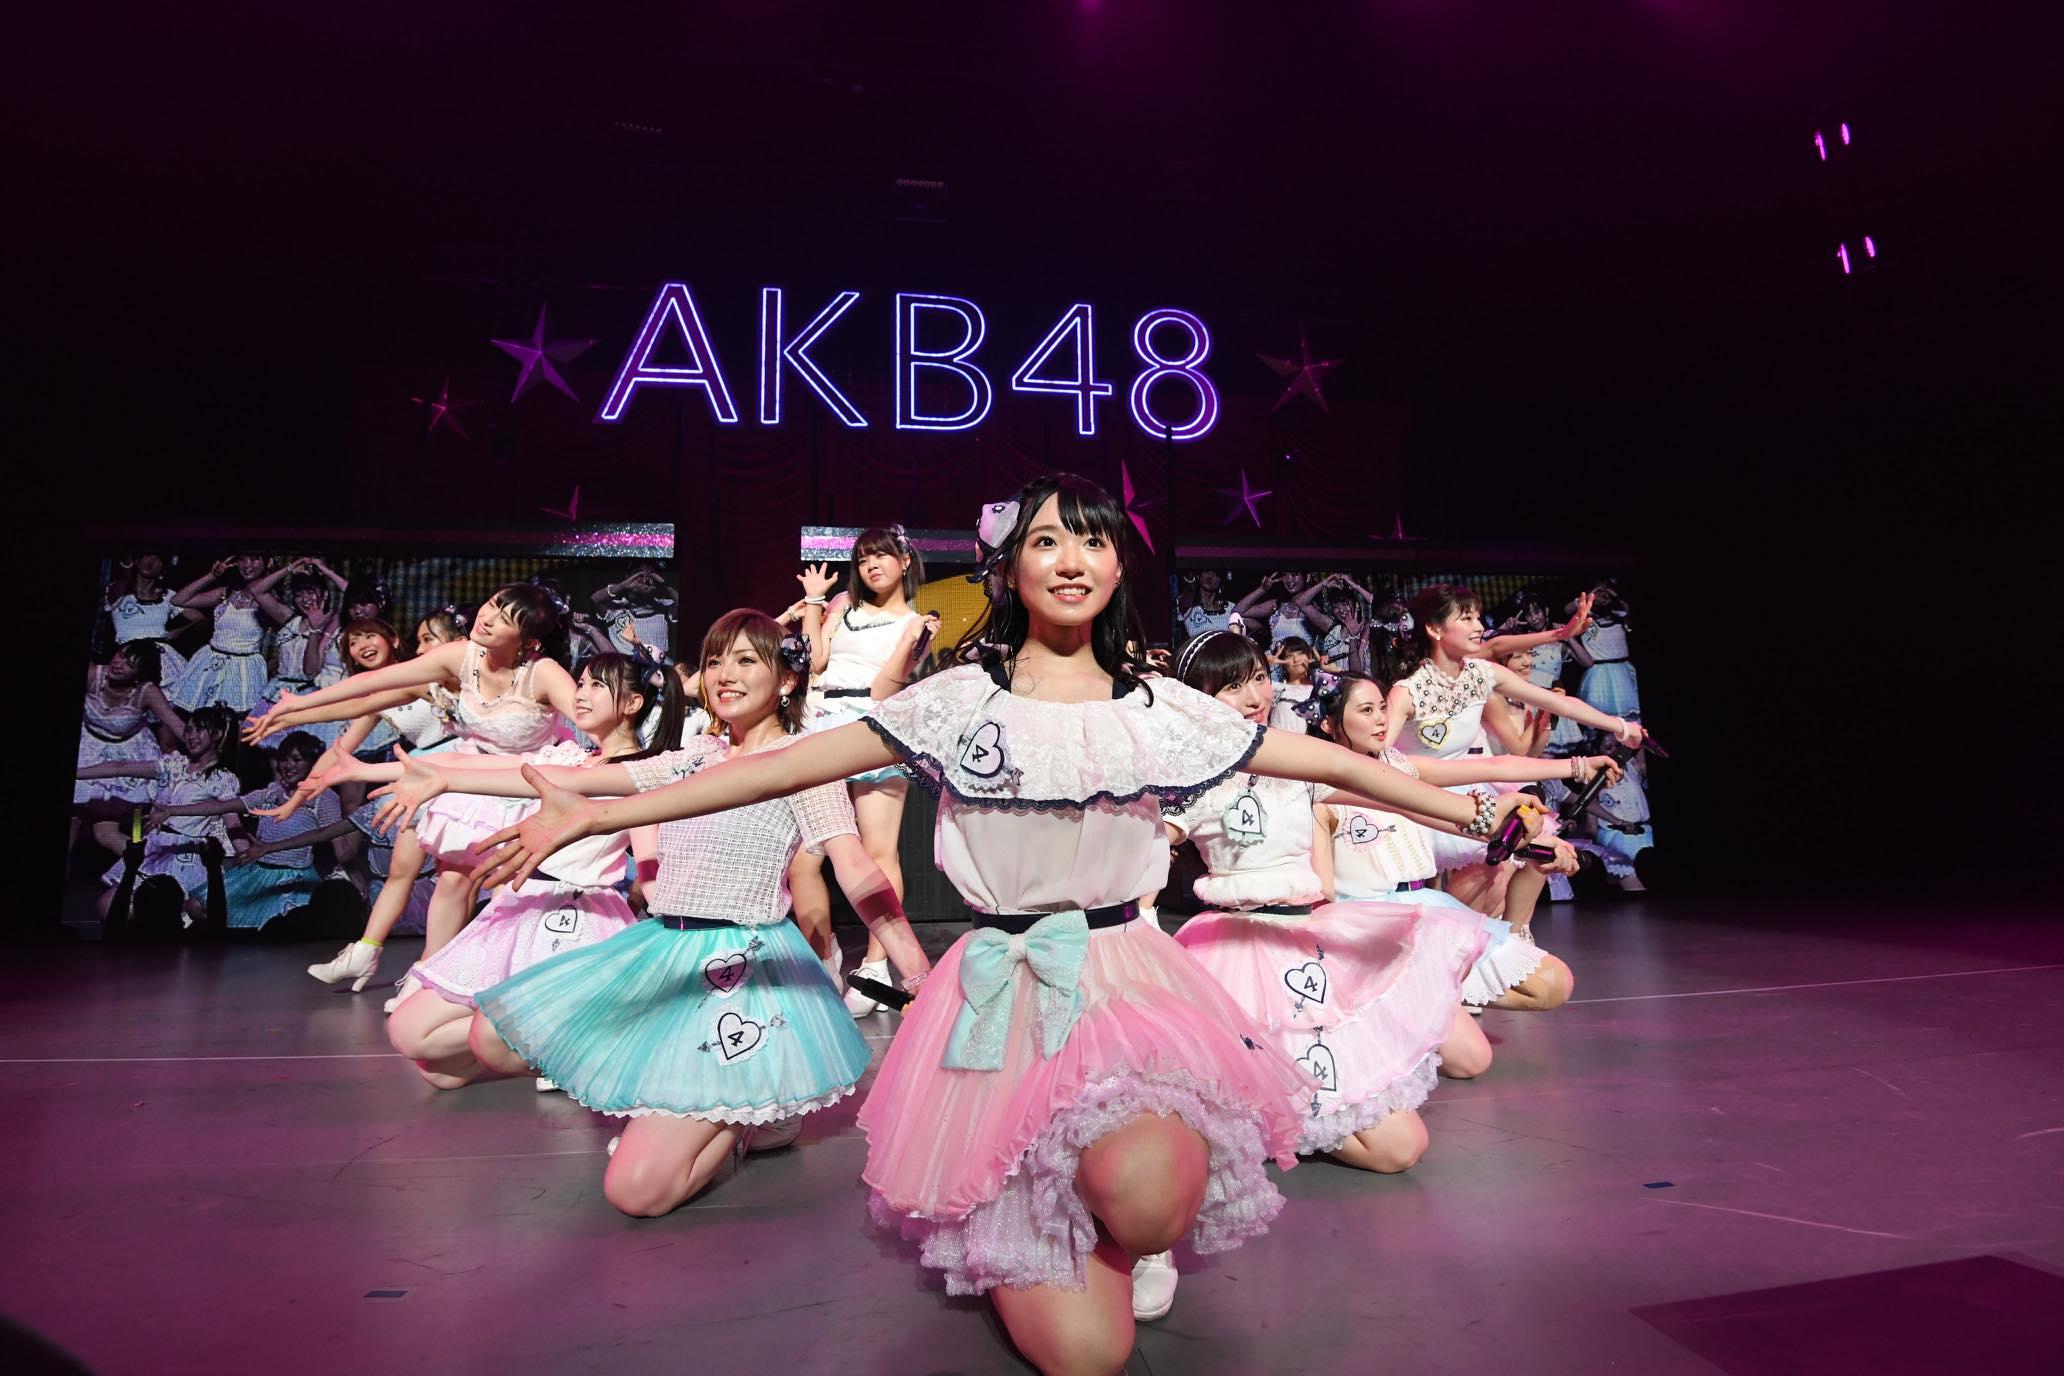 AKB48全国ツアー「神奈川公演」開催、チームBとチーム4のパワーが炸裂!【写真17枚】の画像017